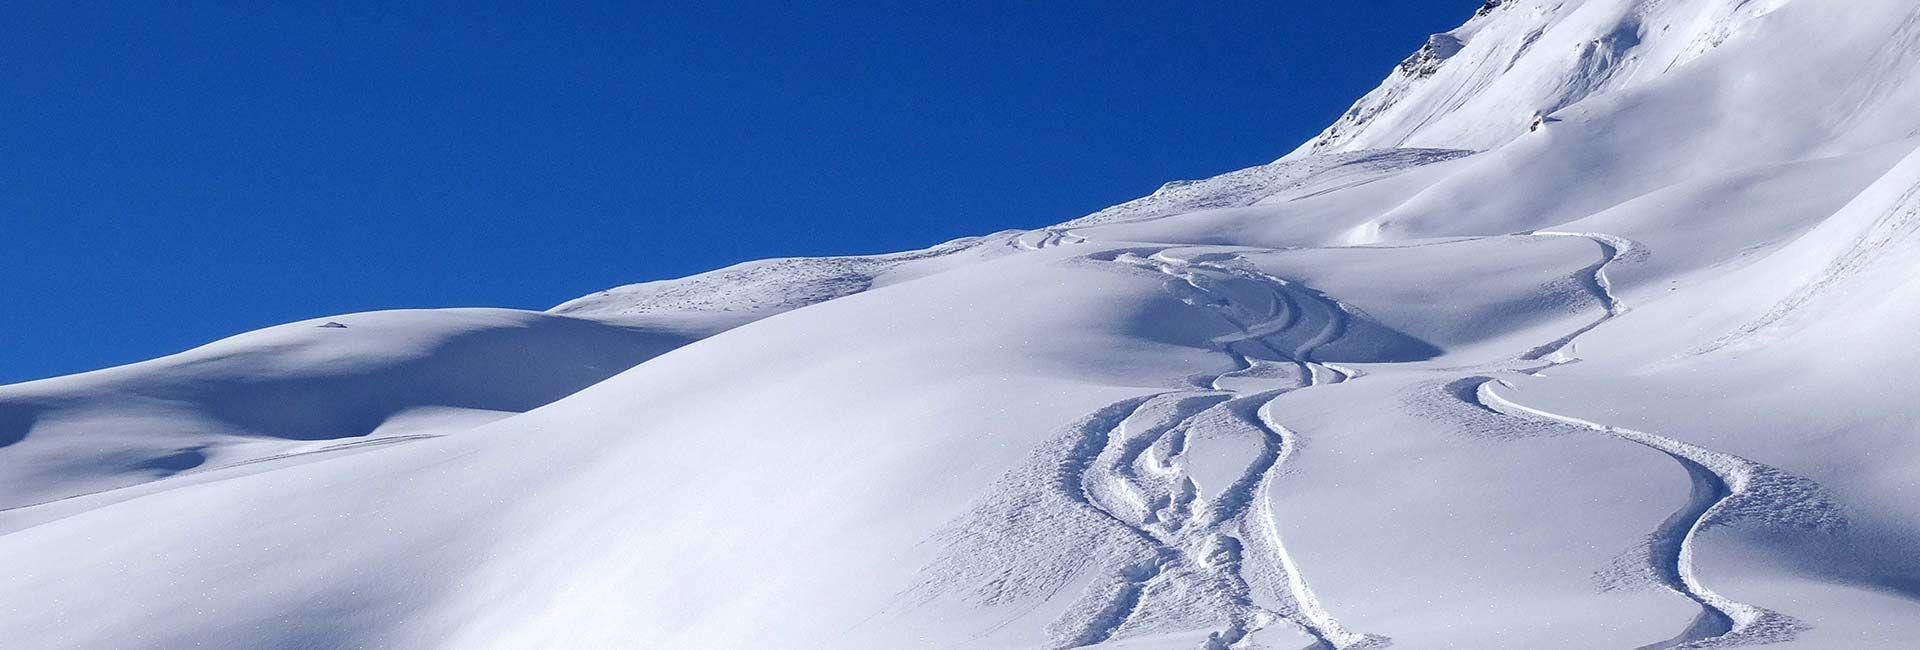 Skiurlaub Hotel Romantica